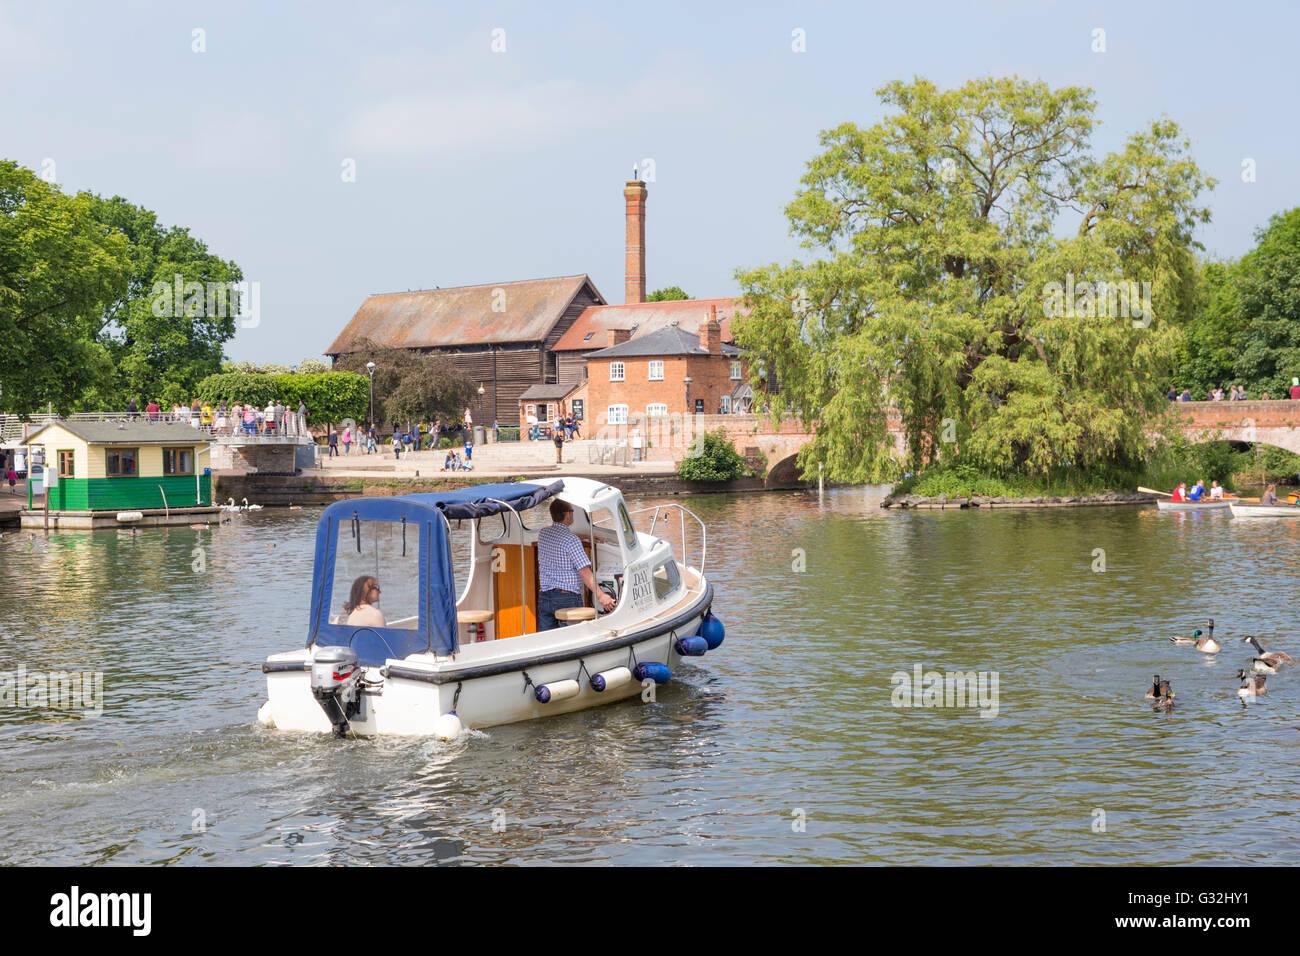 Boating on the River  Avon, Stratford upon Avon, Warwickshire, England, UK - Stock Image